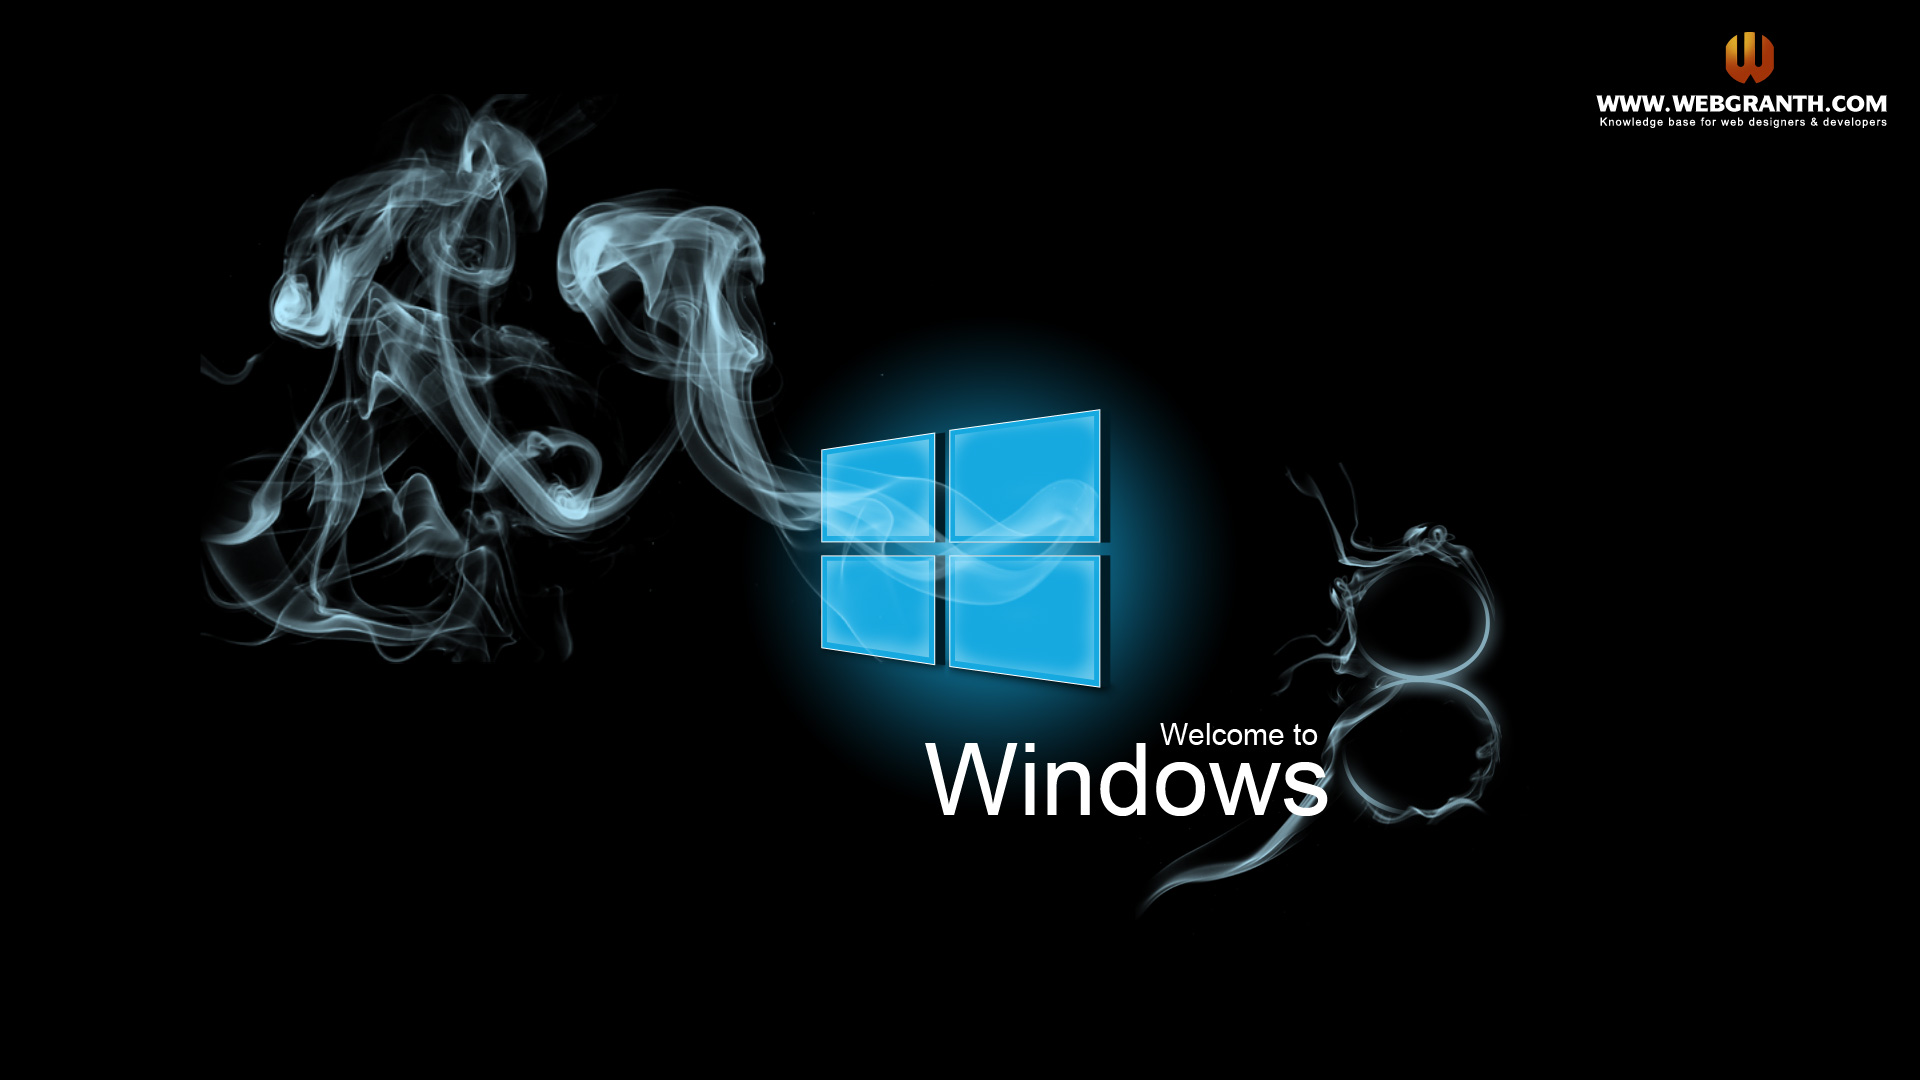 desktop wallpapers hd windows 8 023